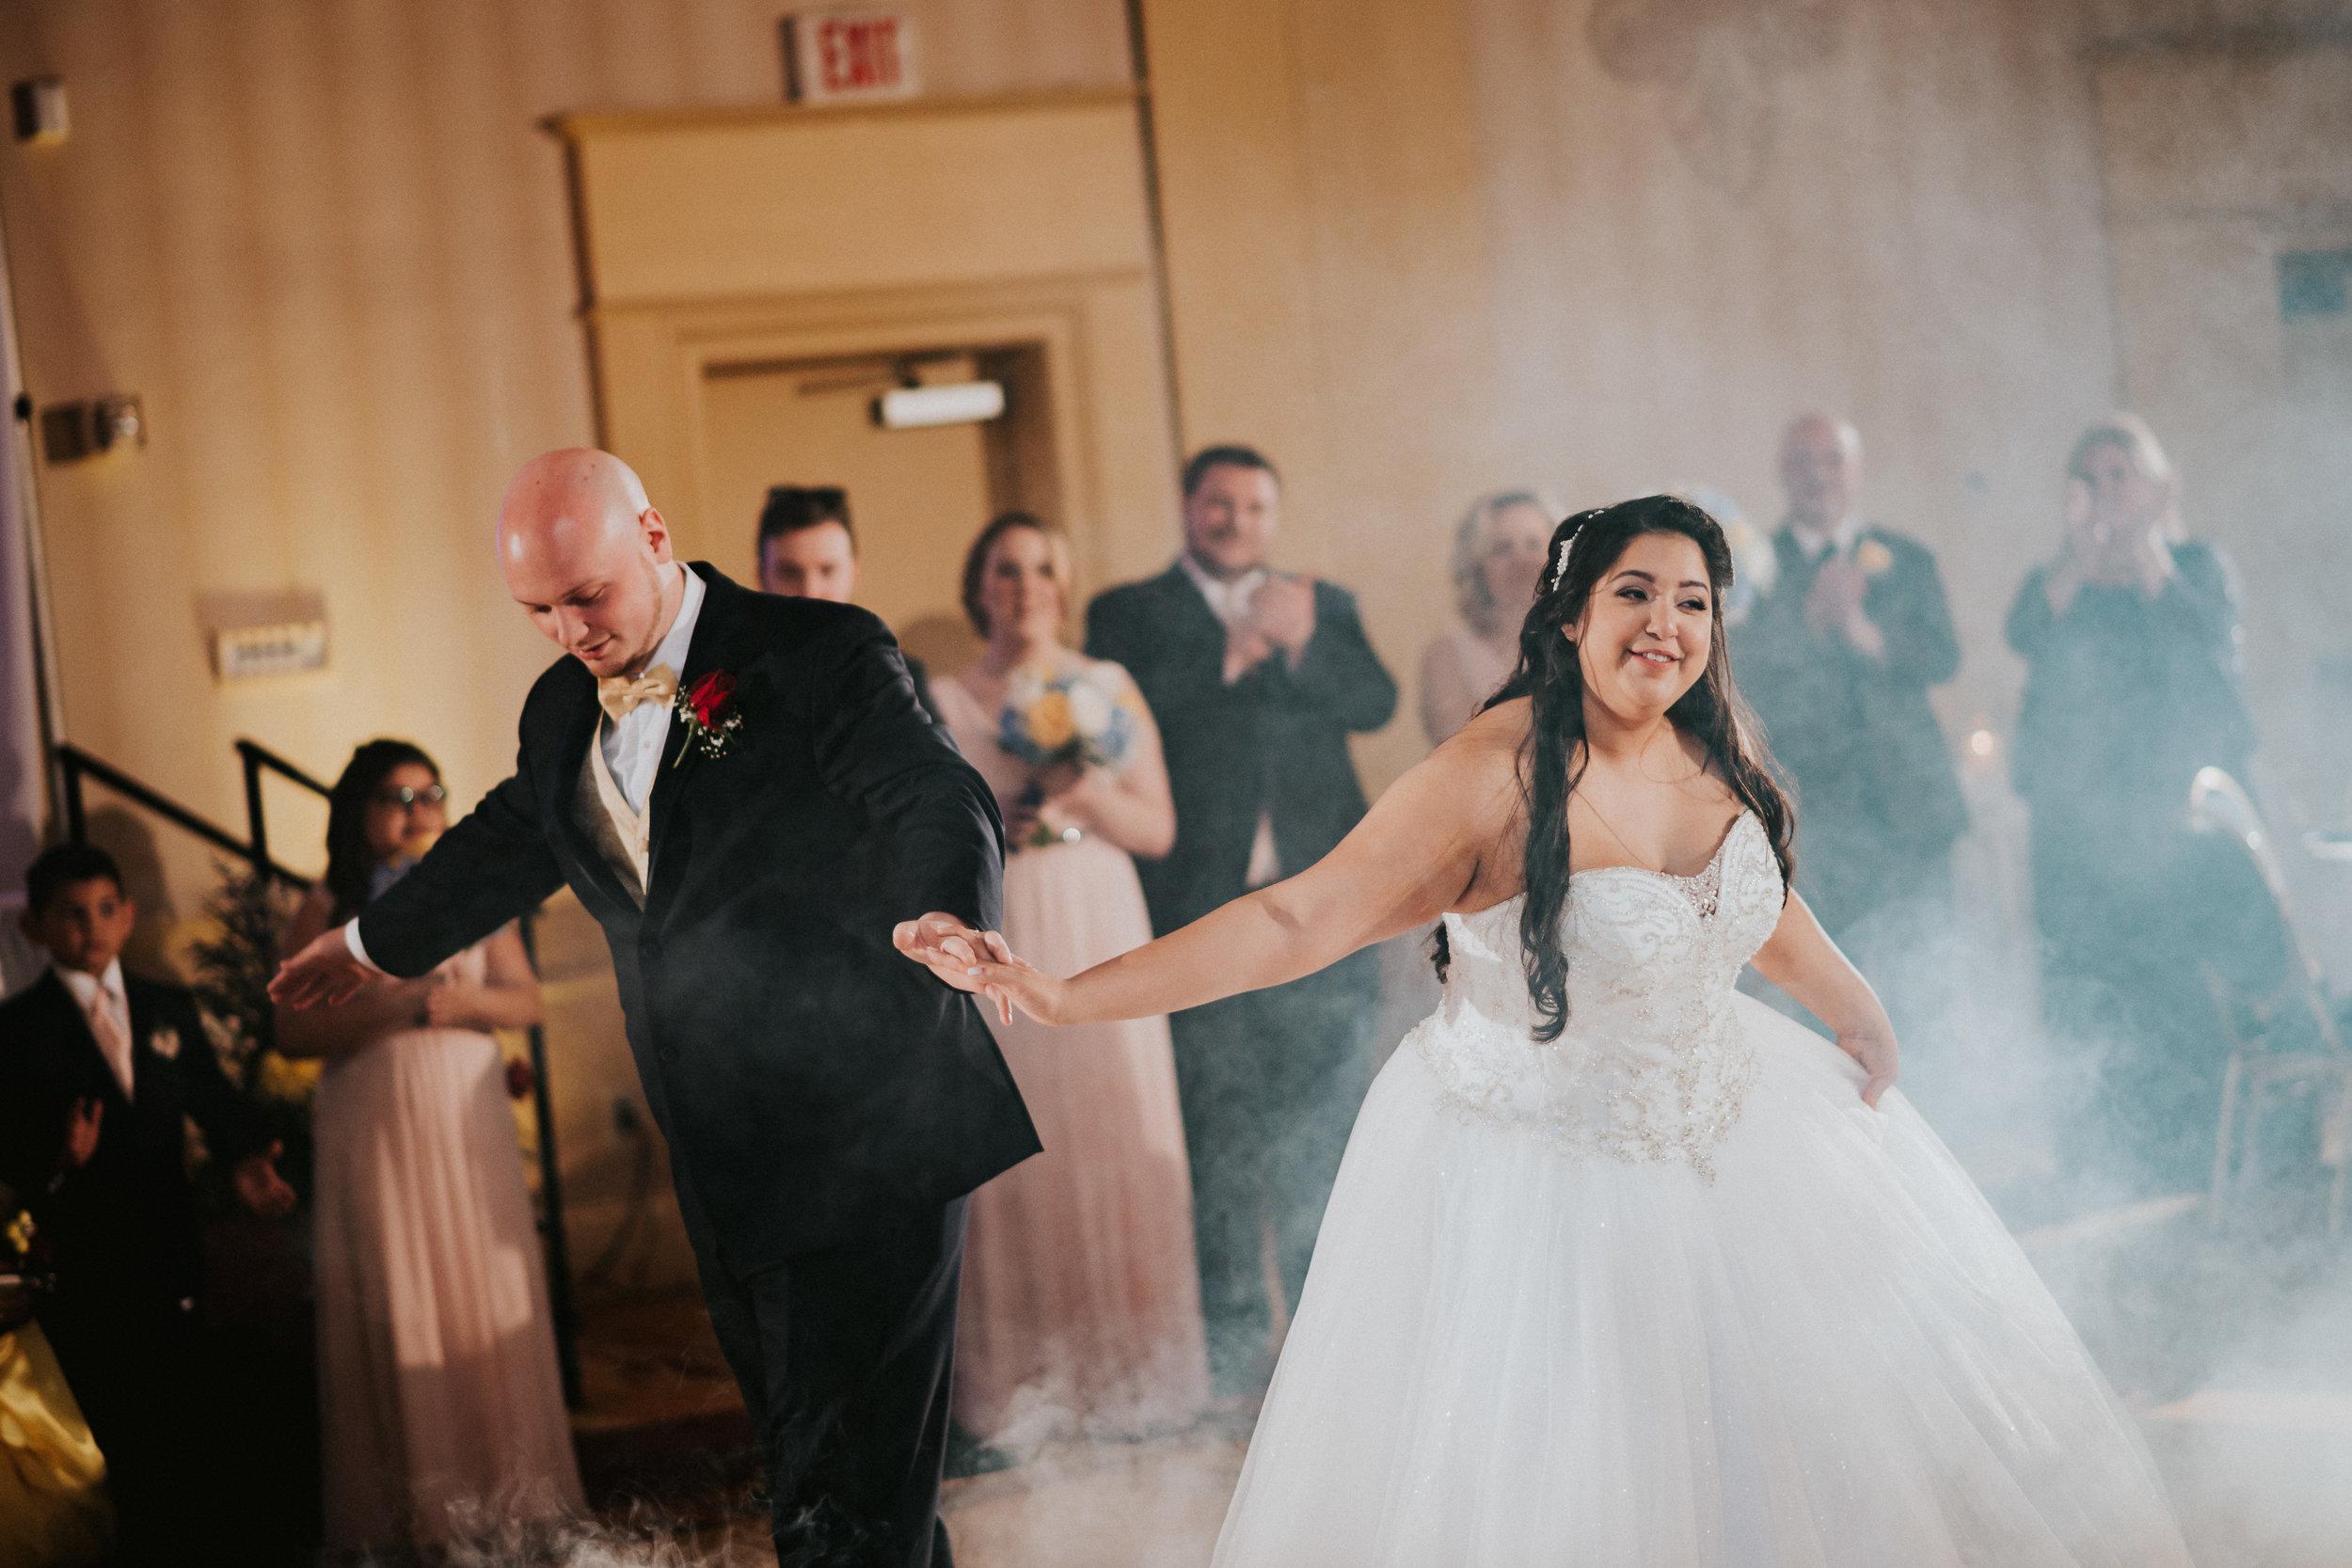 Barclay-Farmstead-Wedding-Rosa-and-Mike-544.jpg